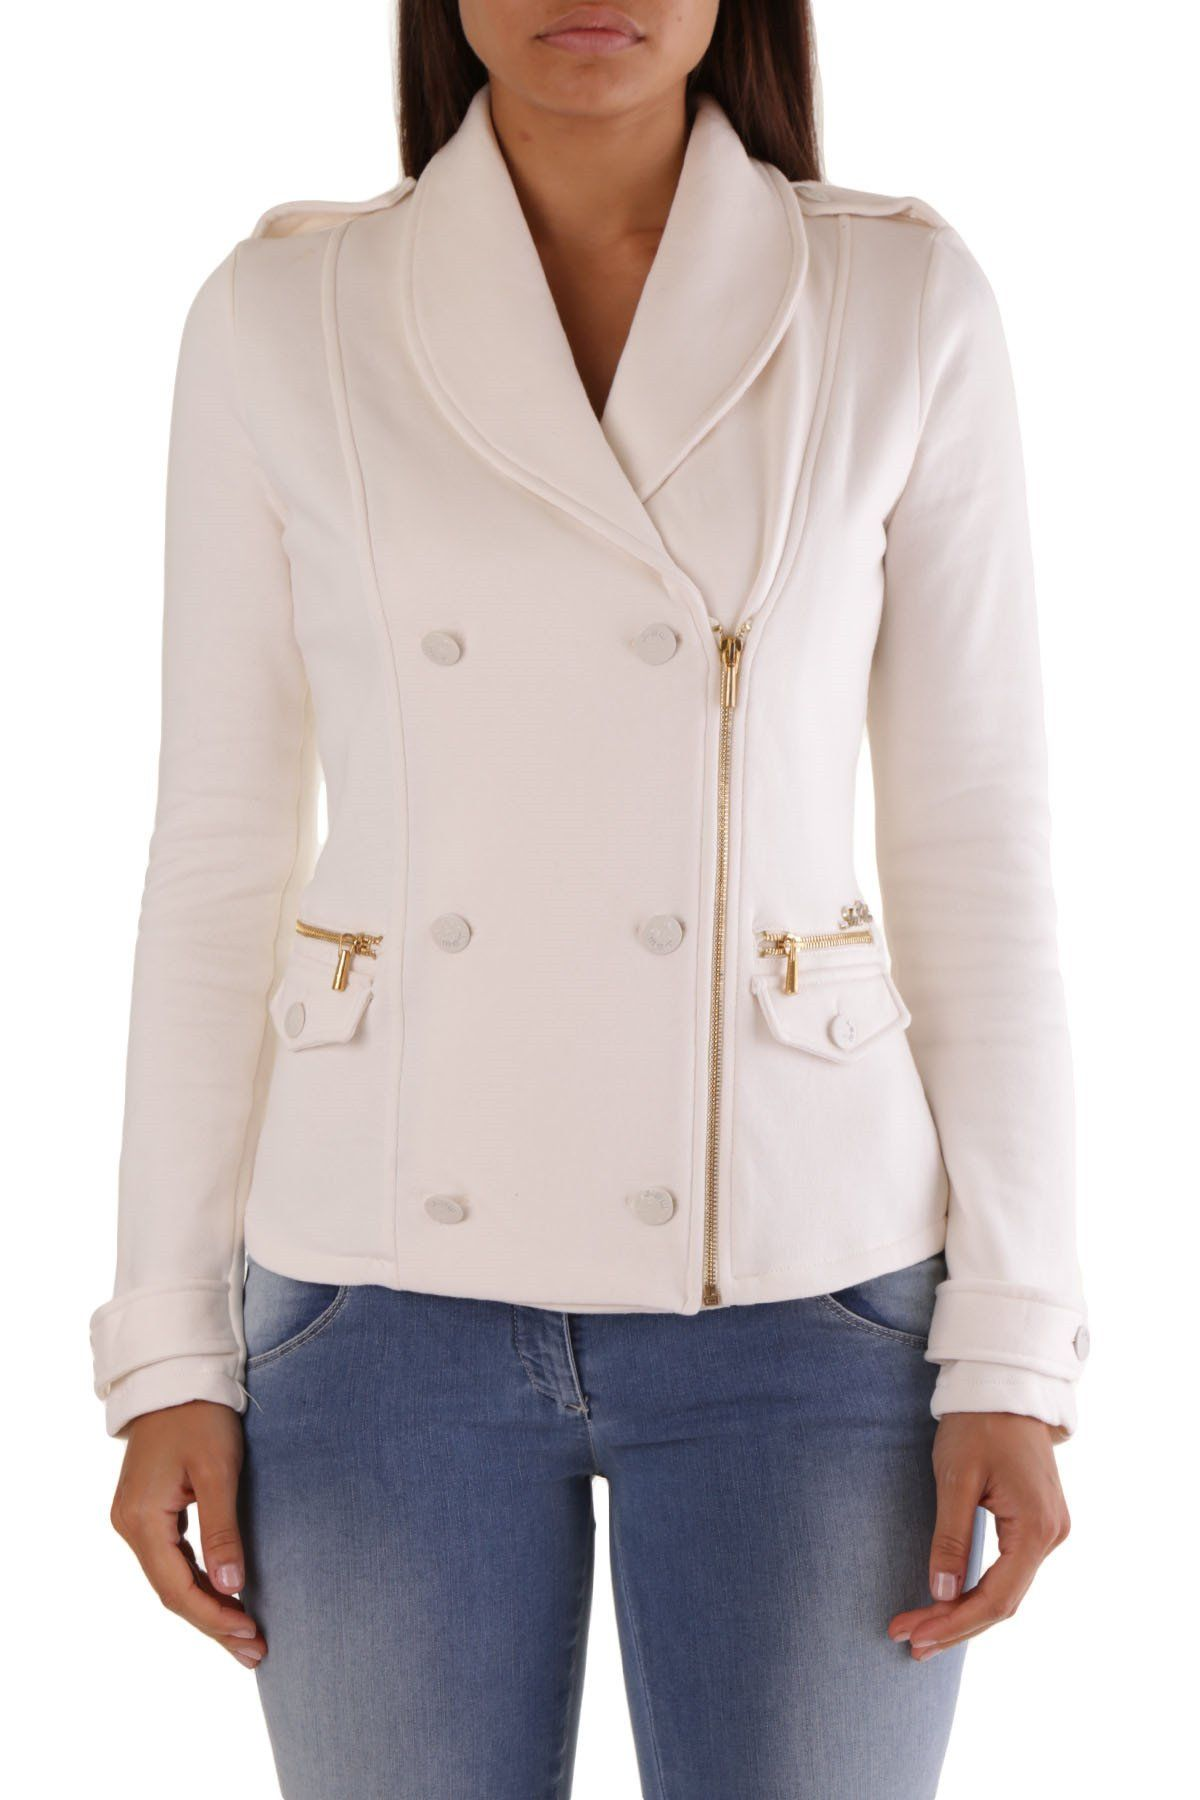 Met Women's Blazer In White